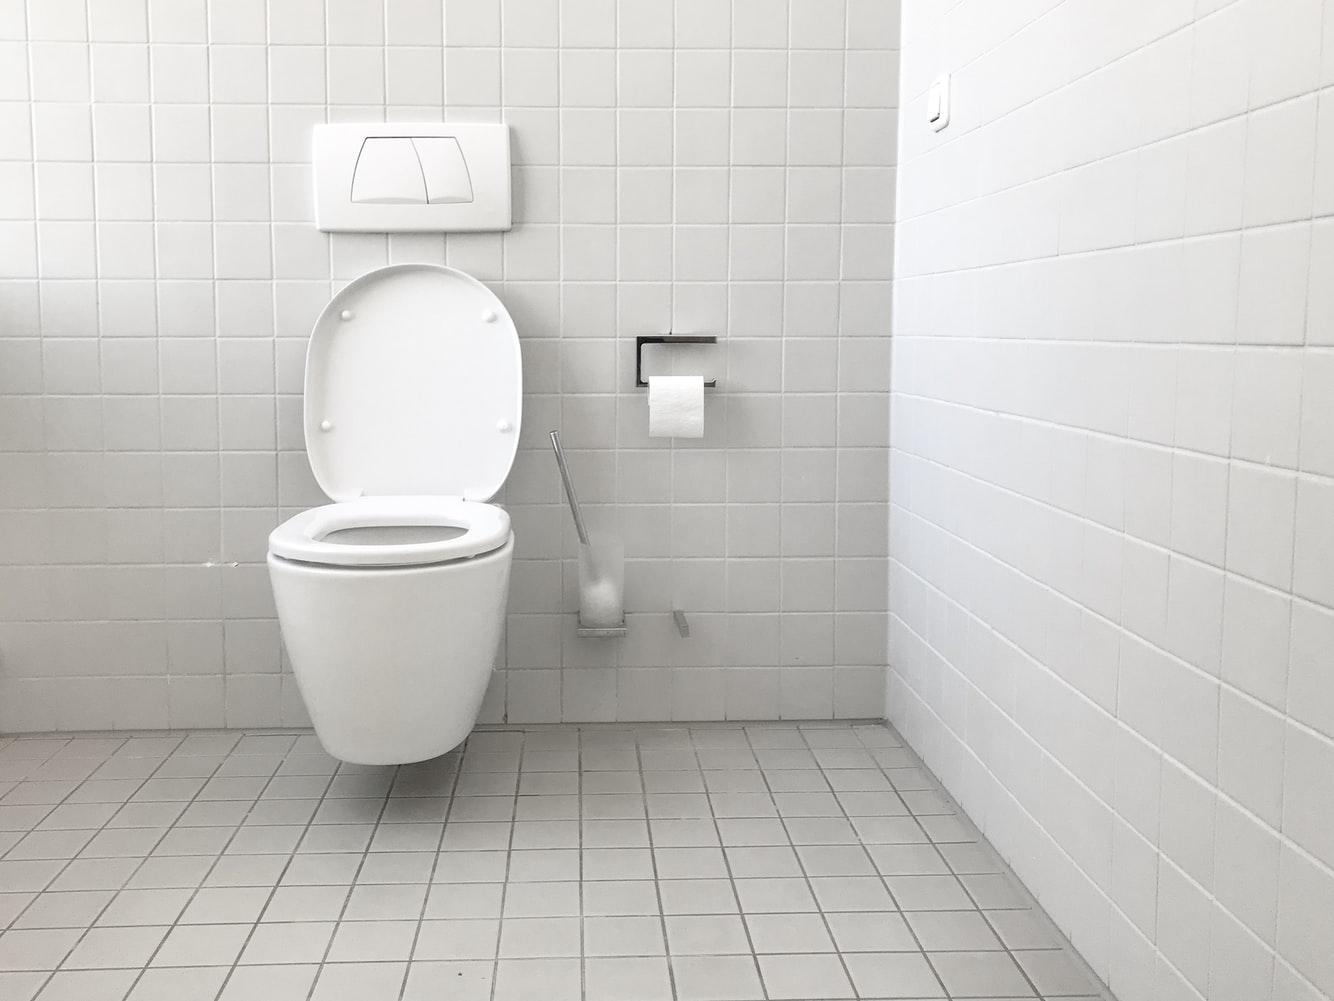 inteligentna toaleta